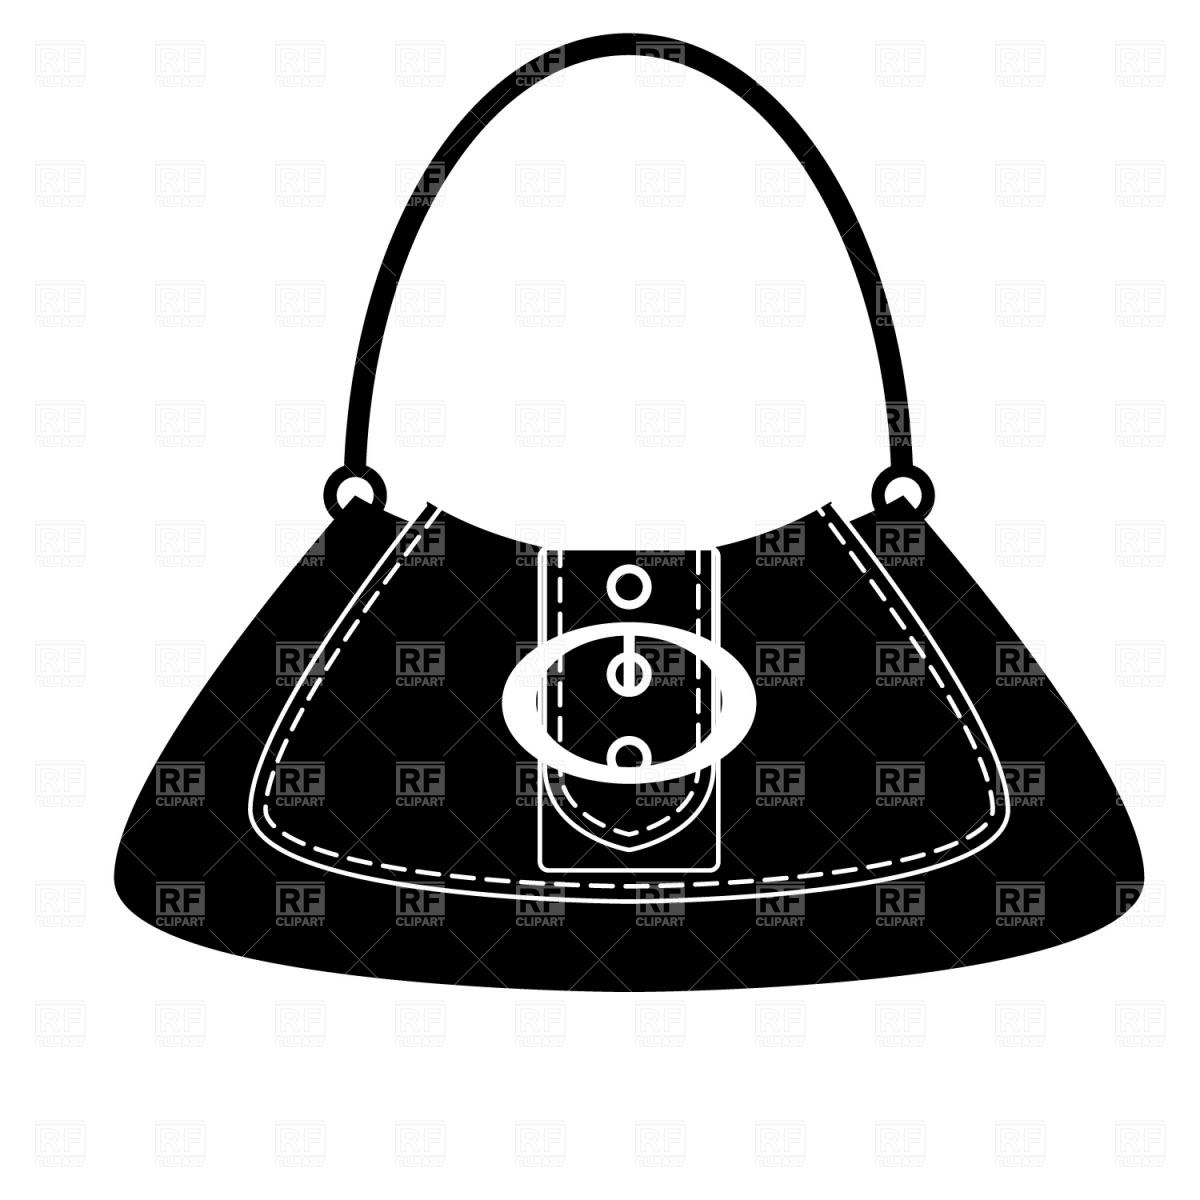 1200x1200 Dolly Bag Vector Image Vector Artwork Of Beauty, Fashion